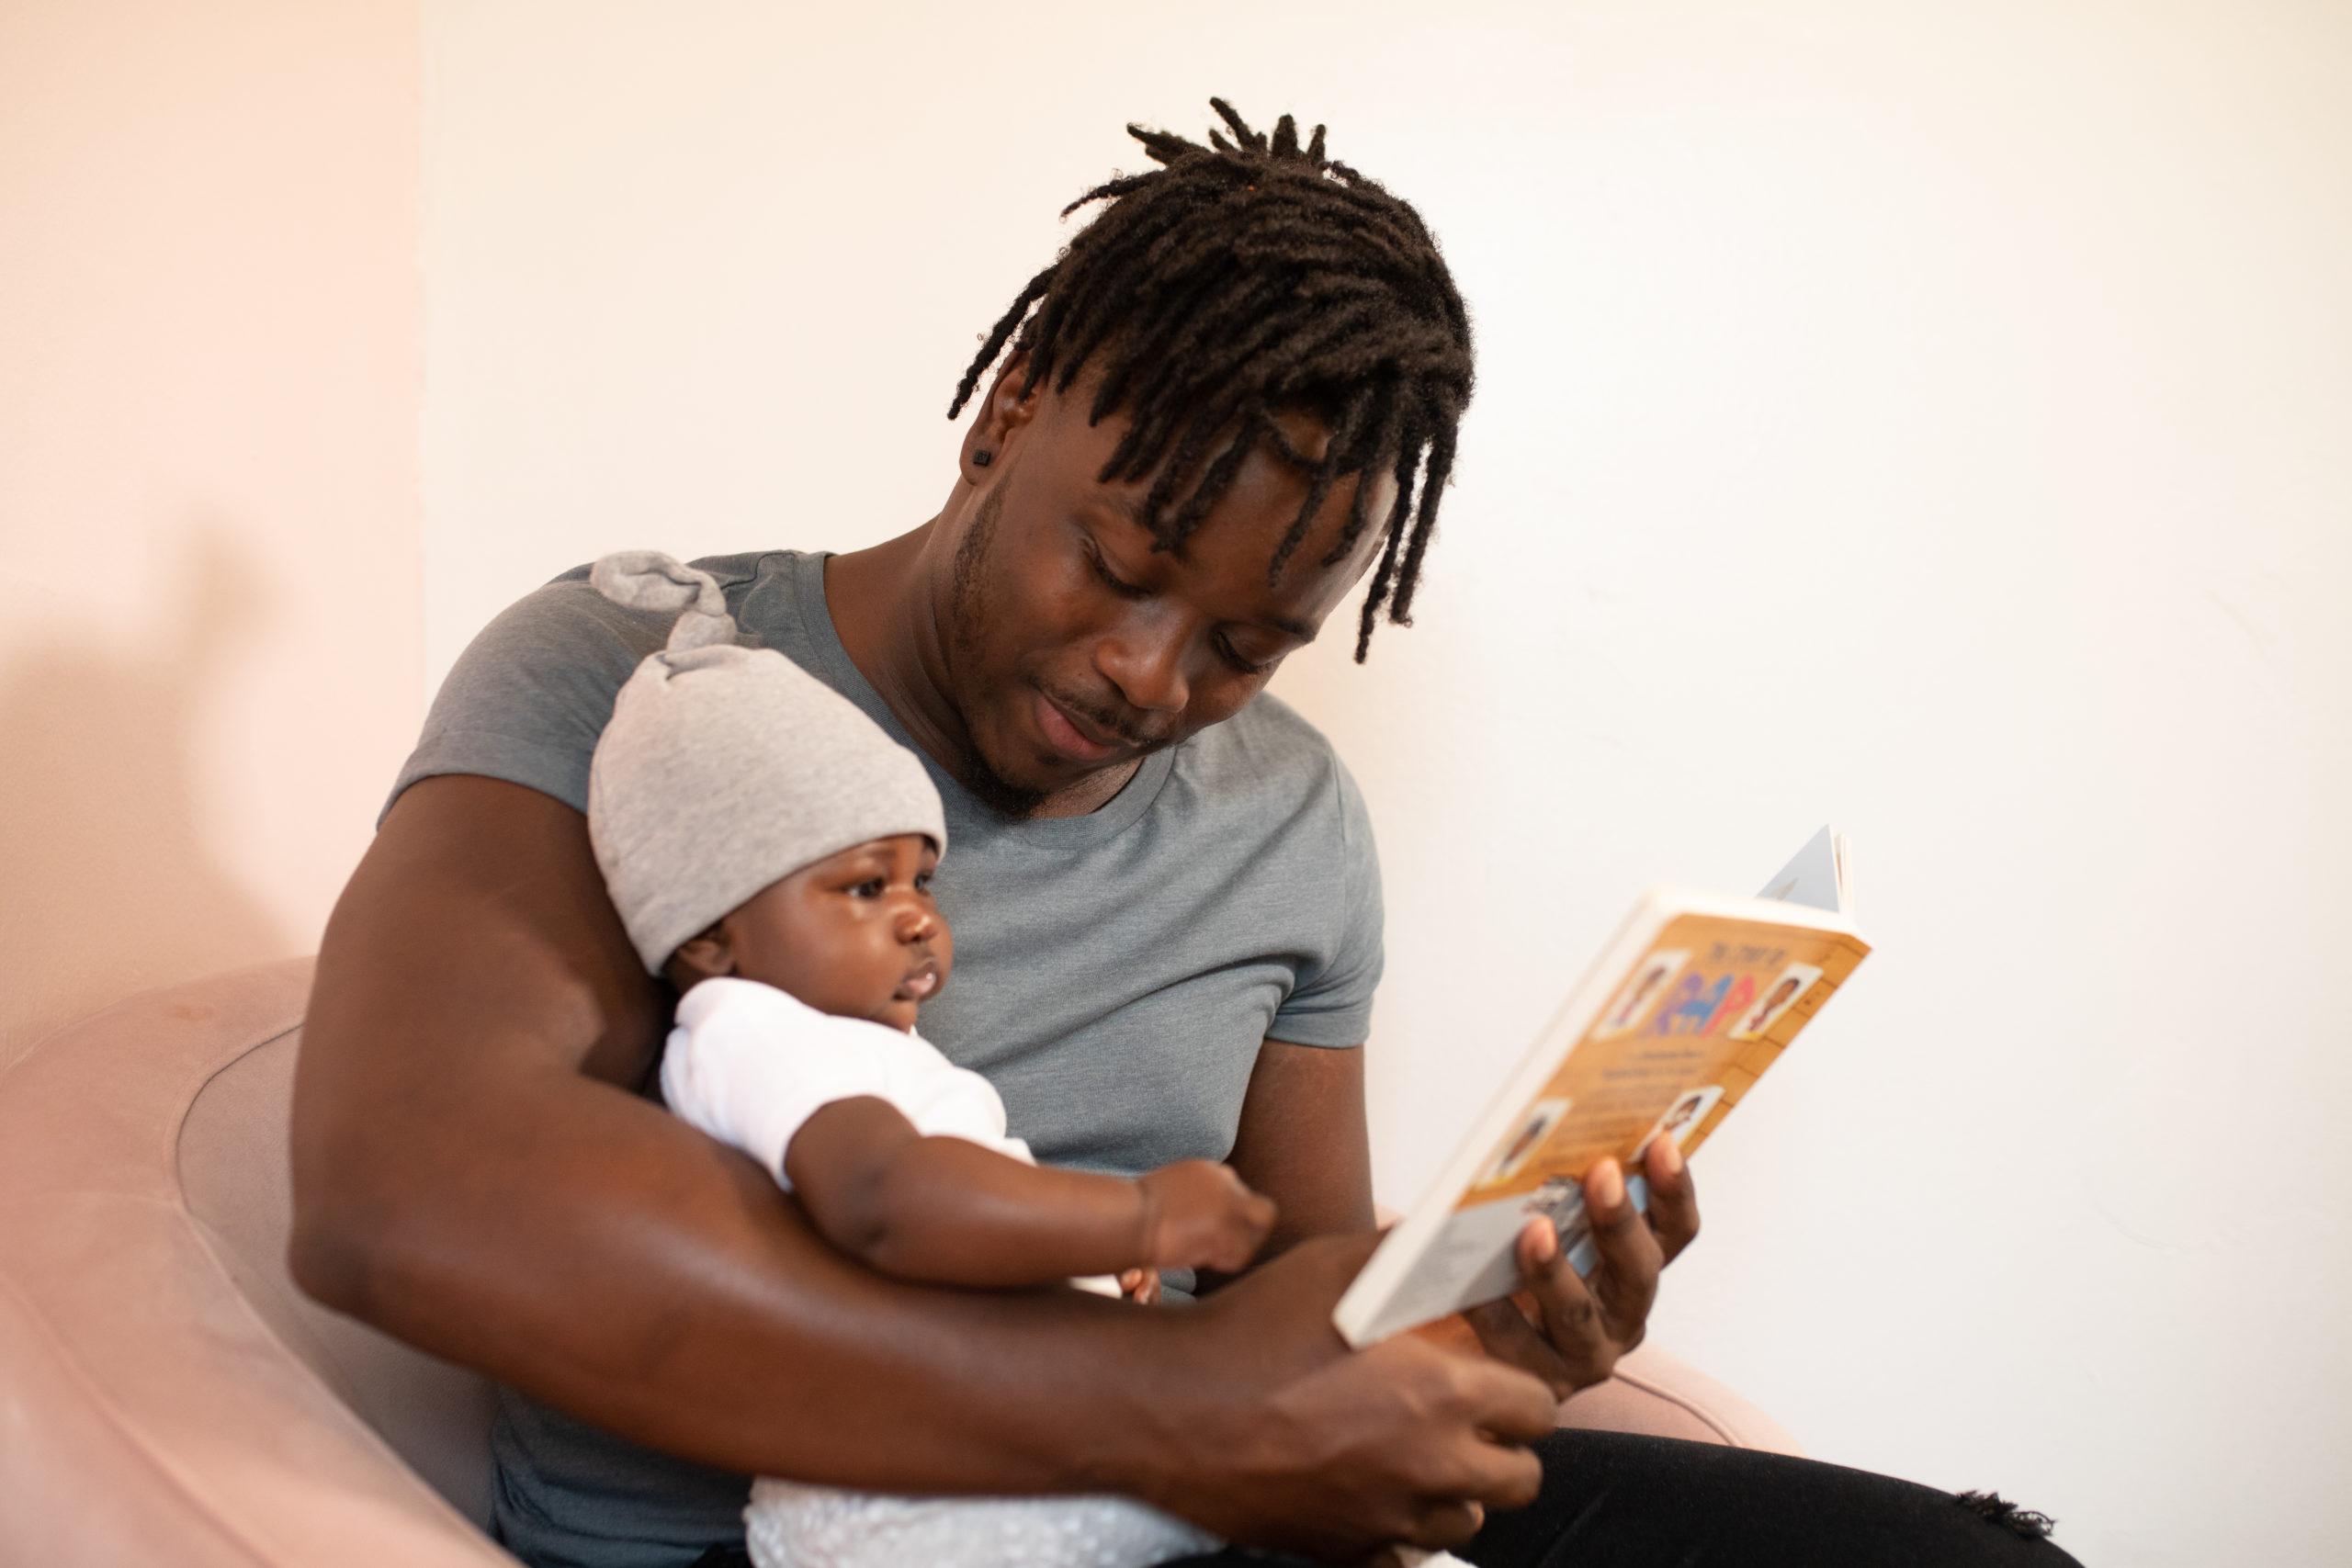 Man in gray shirt holding baby in white onesie